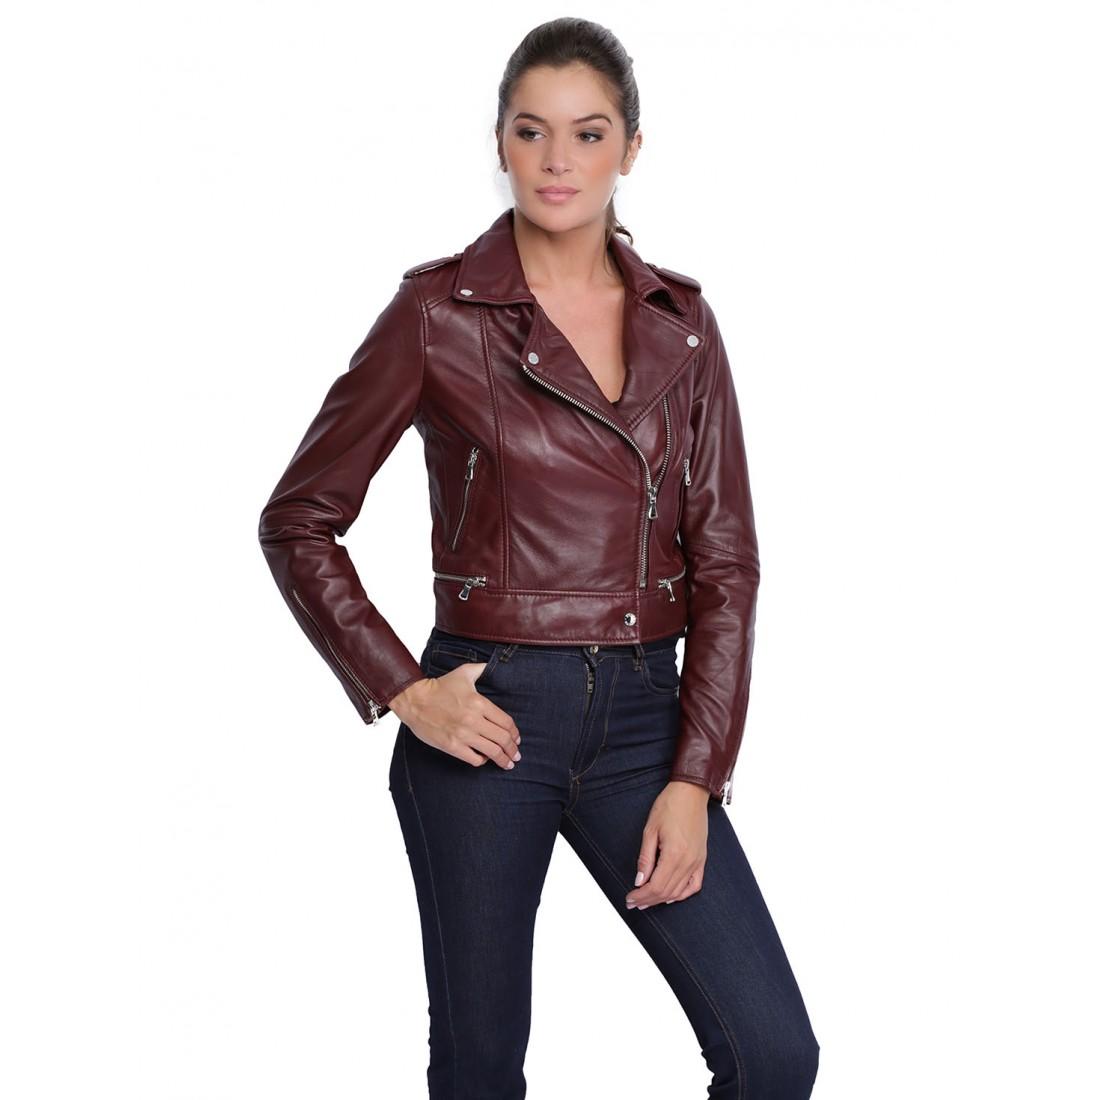 d0eedad20987 blouson-cuir-femme-oakwood-yoko-62326-bordeaux.jpg